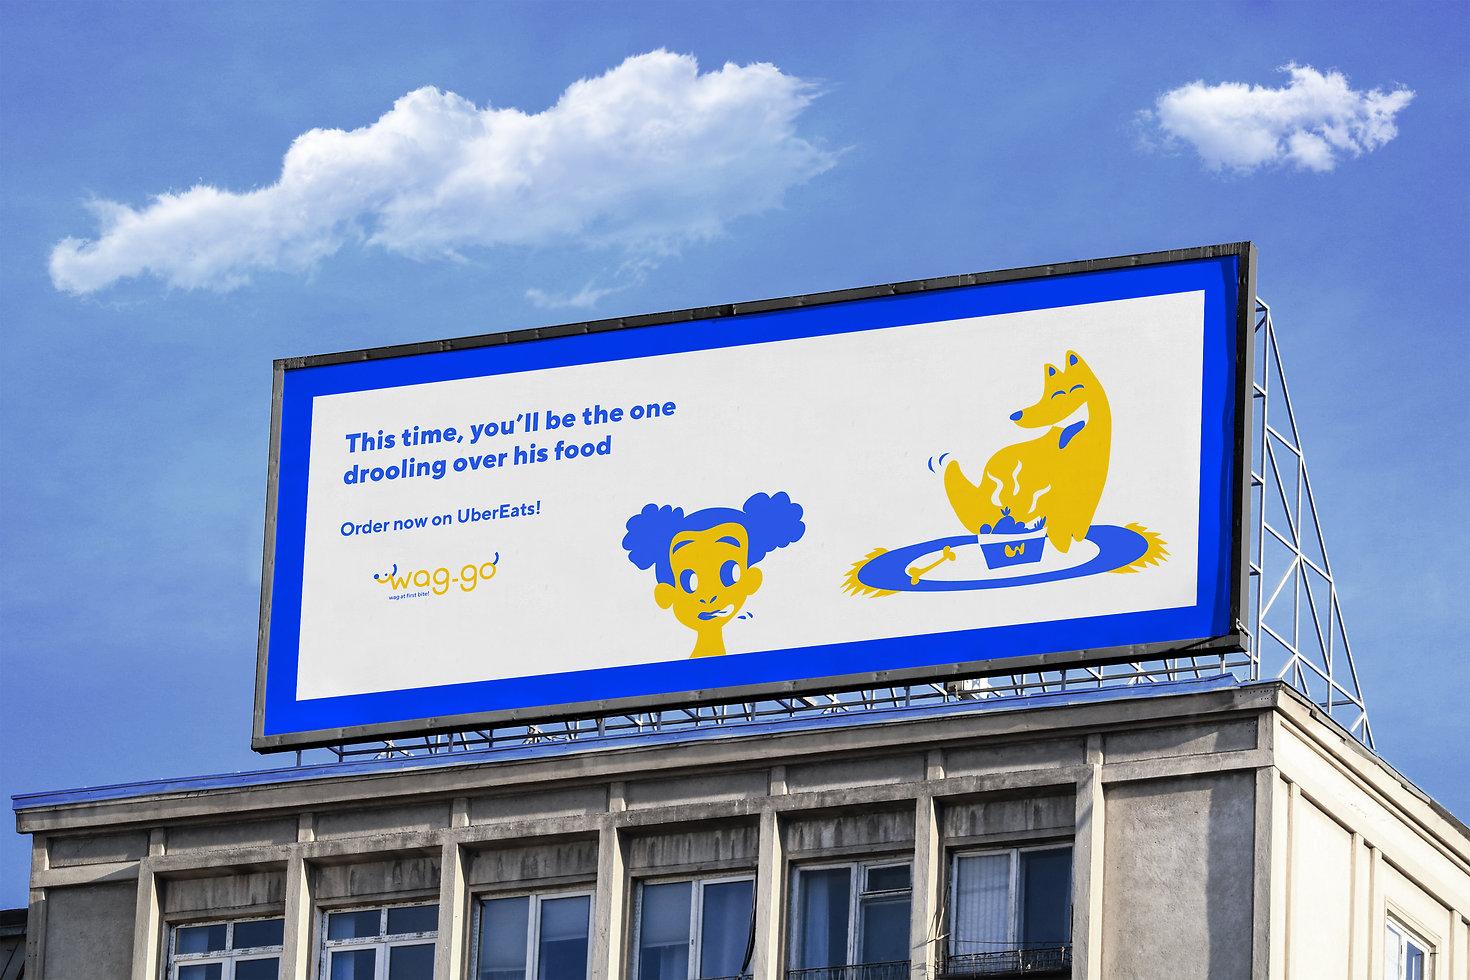 Horizontal billboard